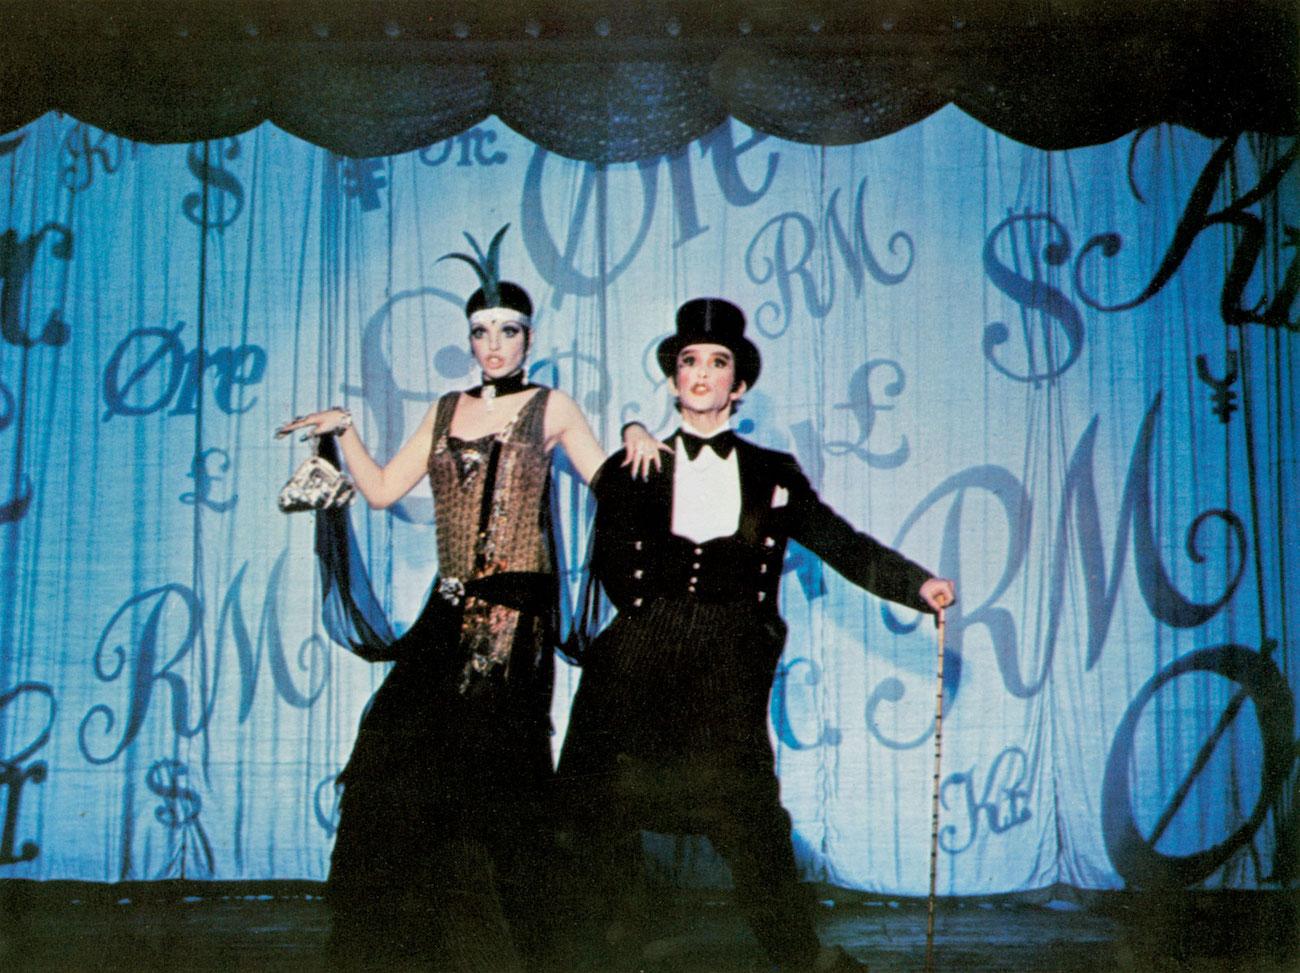 Cabaret Liza Minnelli Joel Grey The Berlin